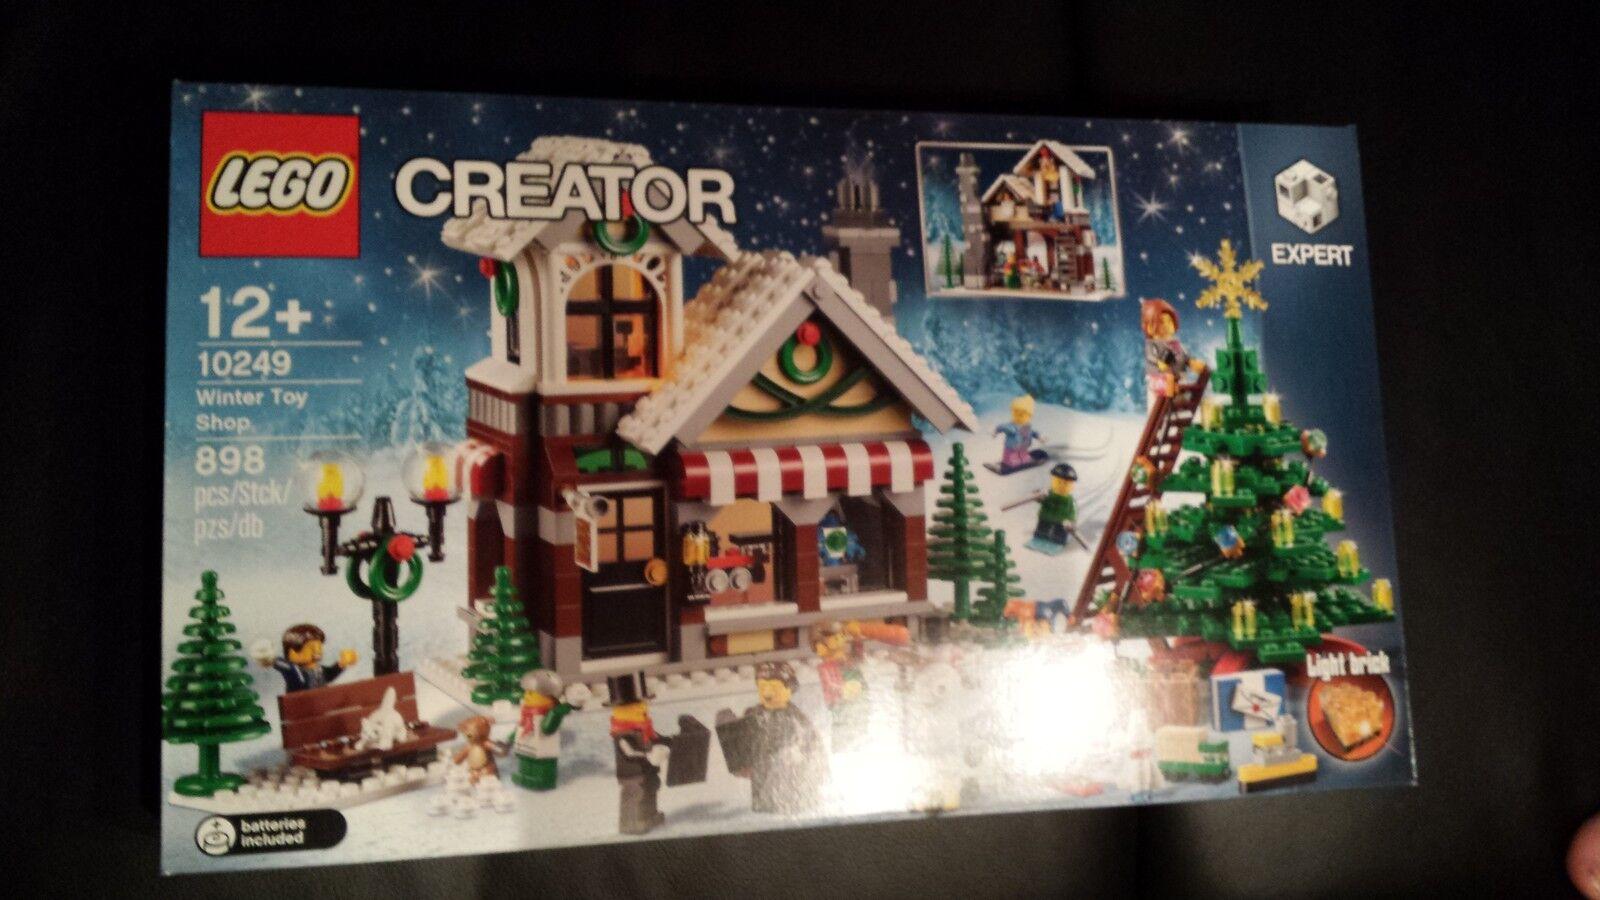 LEGO10249 Creator